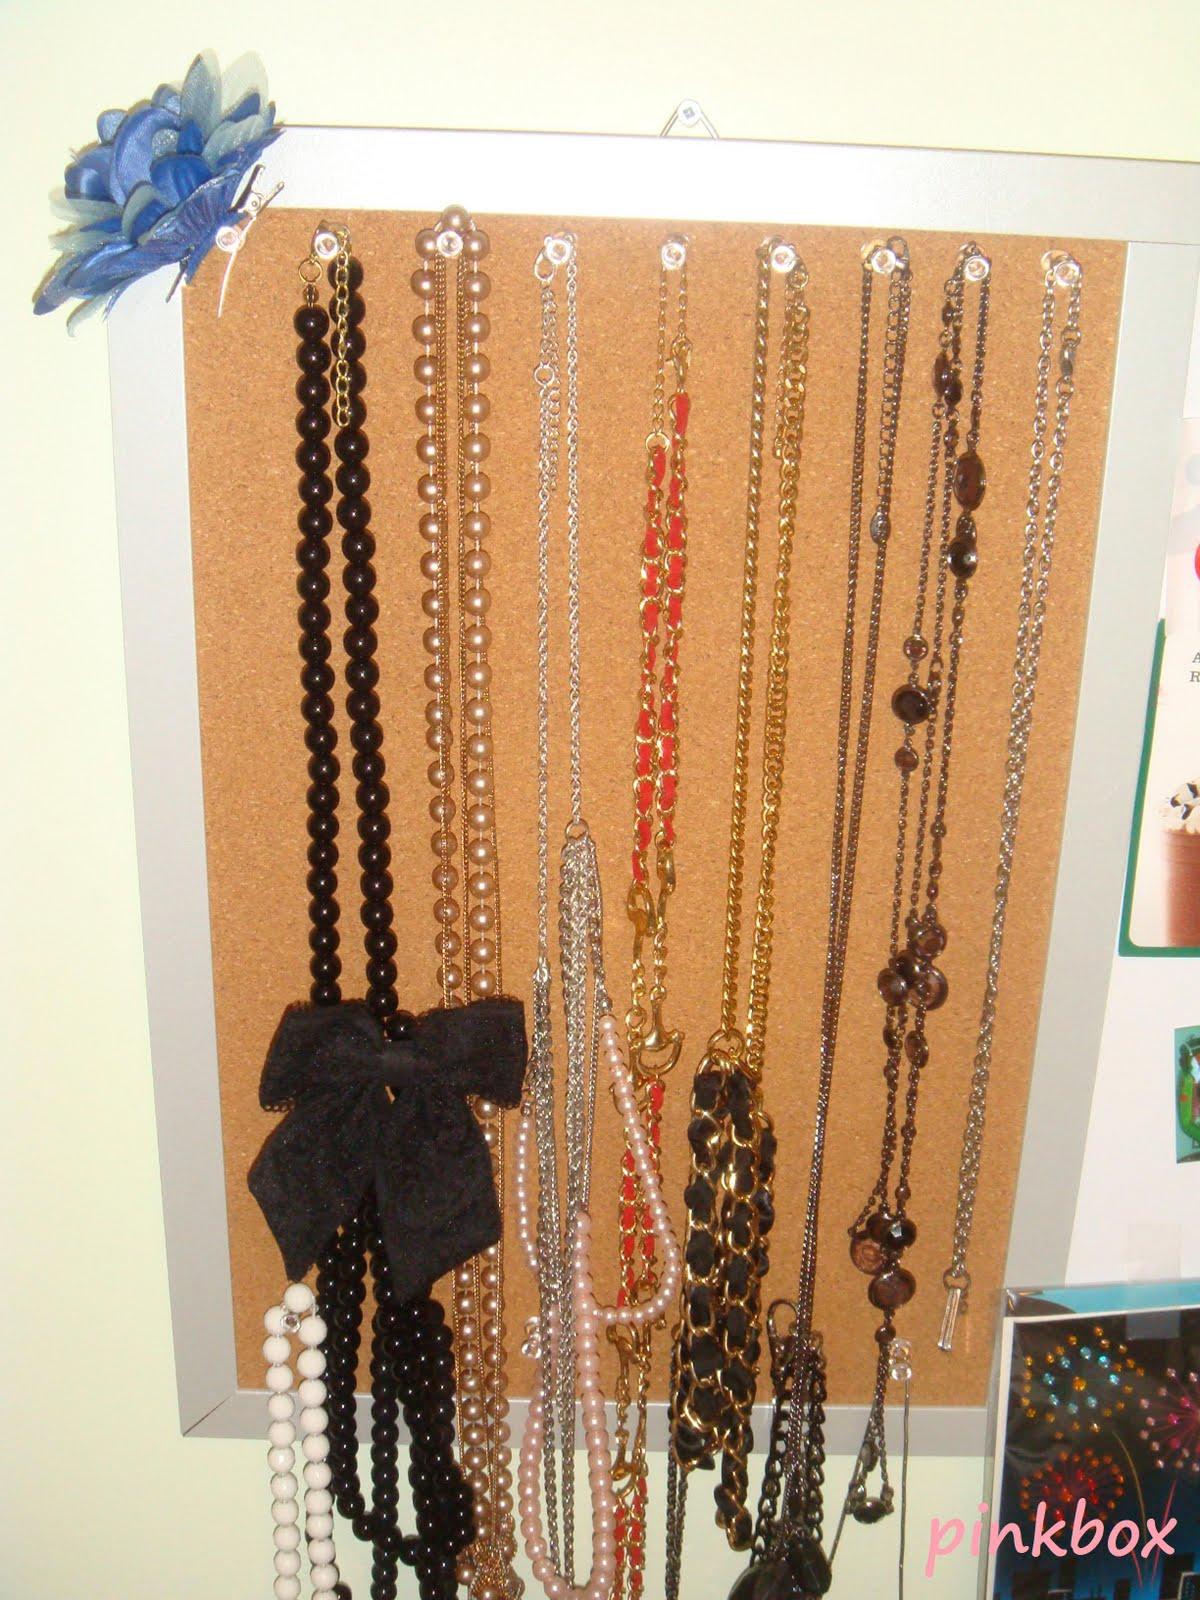 pinkbox makeup diy jewelry necklace holder